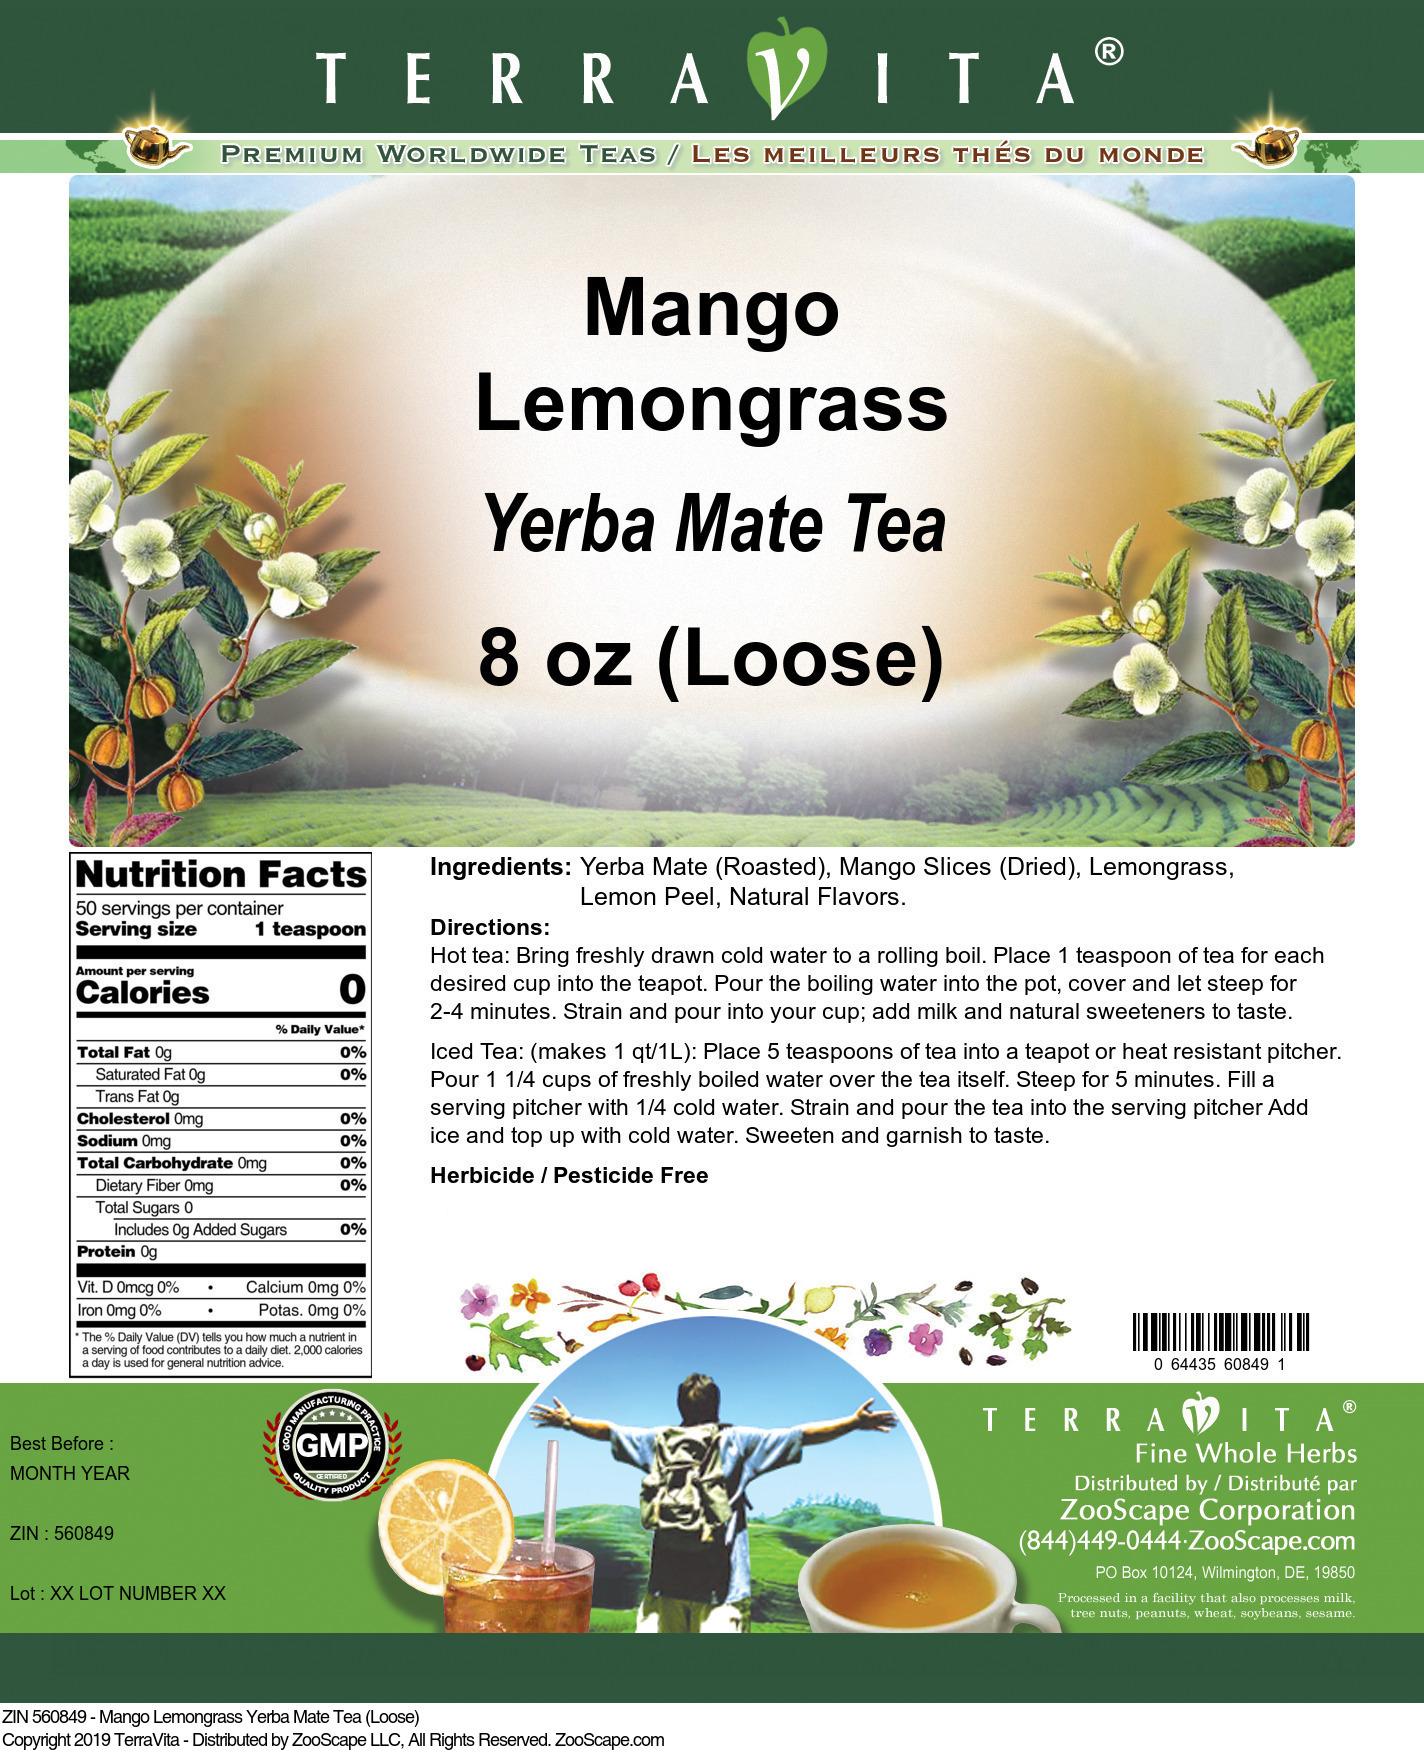 Mango Lemongrass Yerba Mate